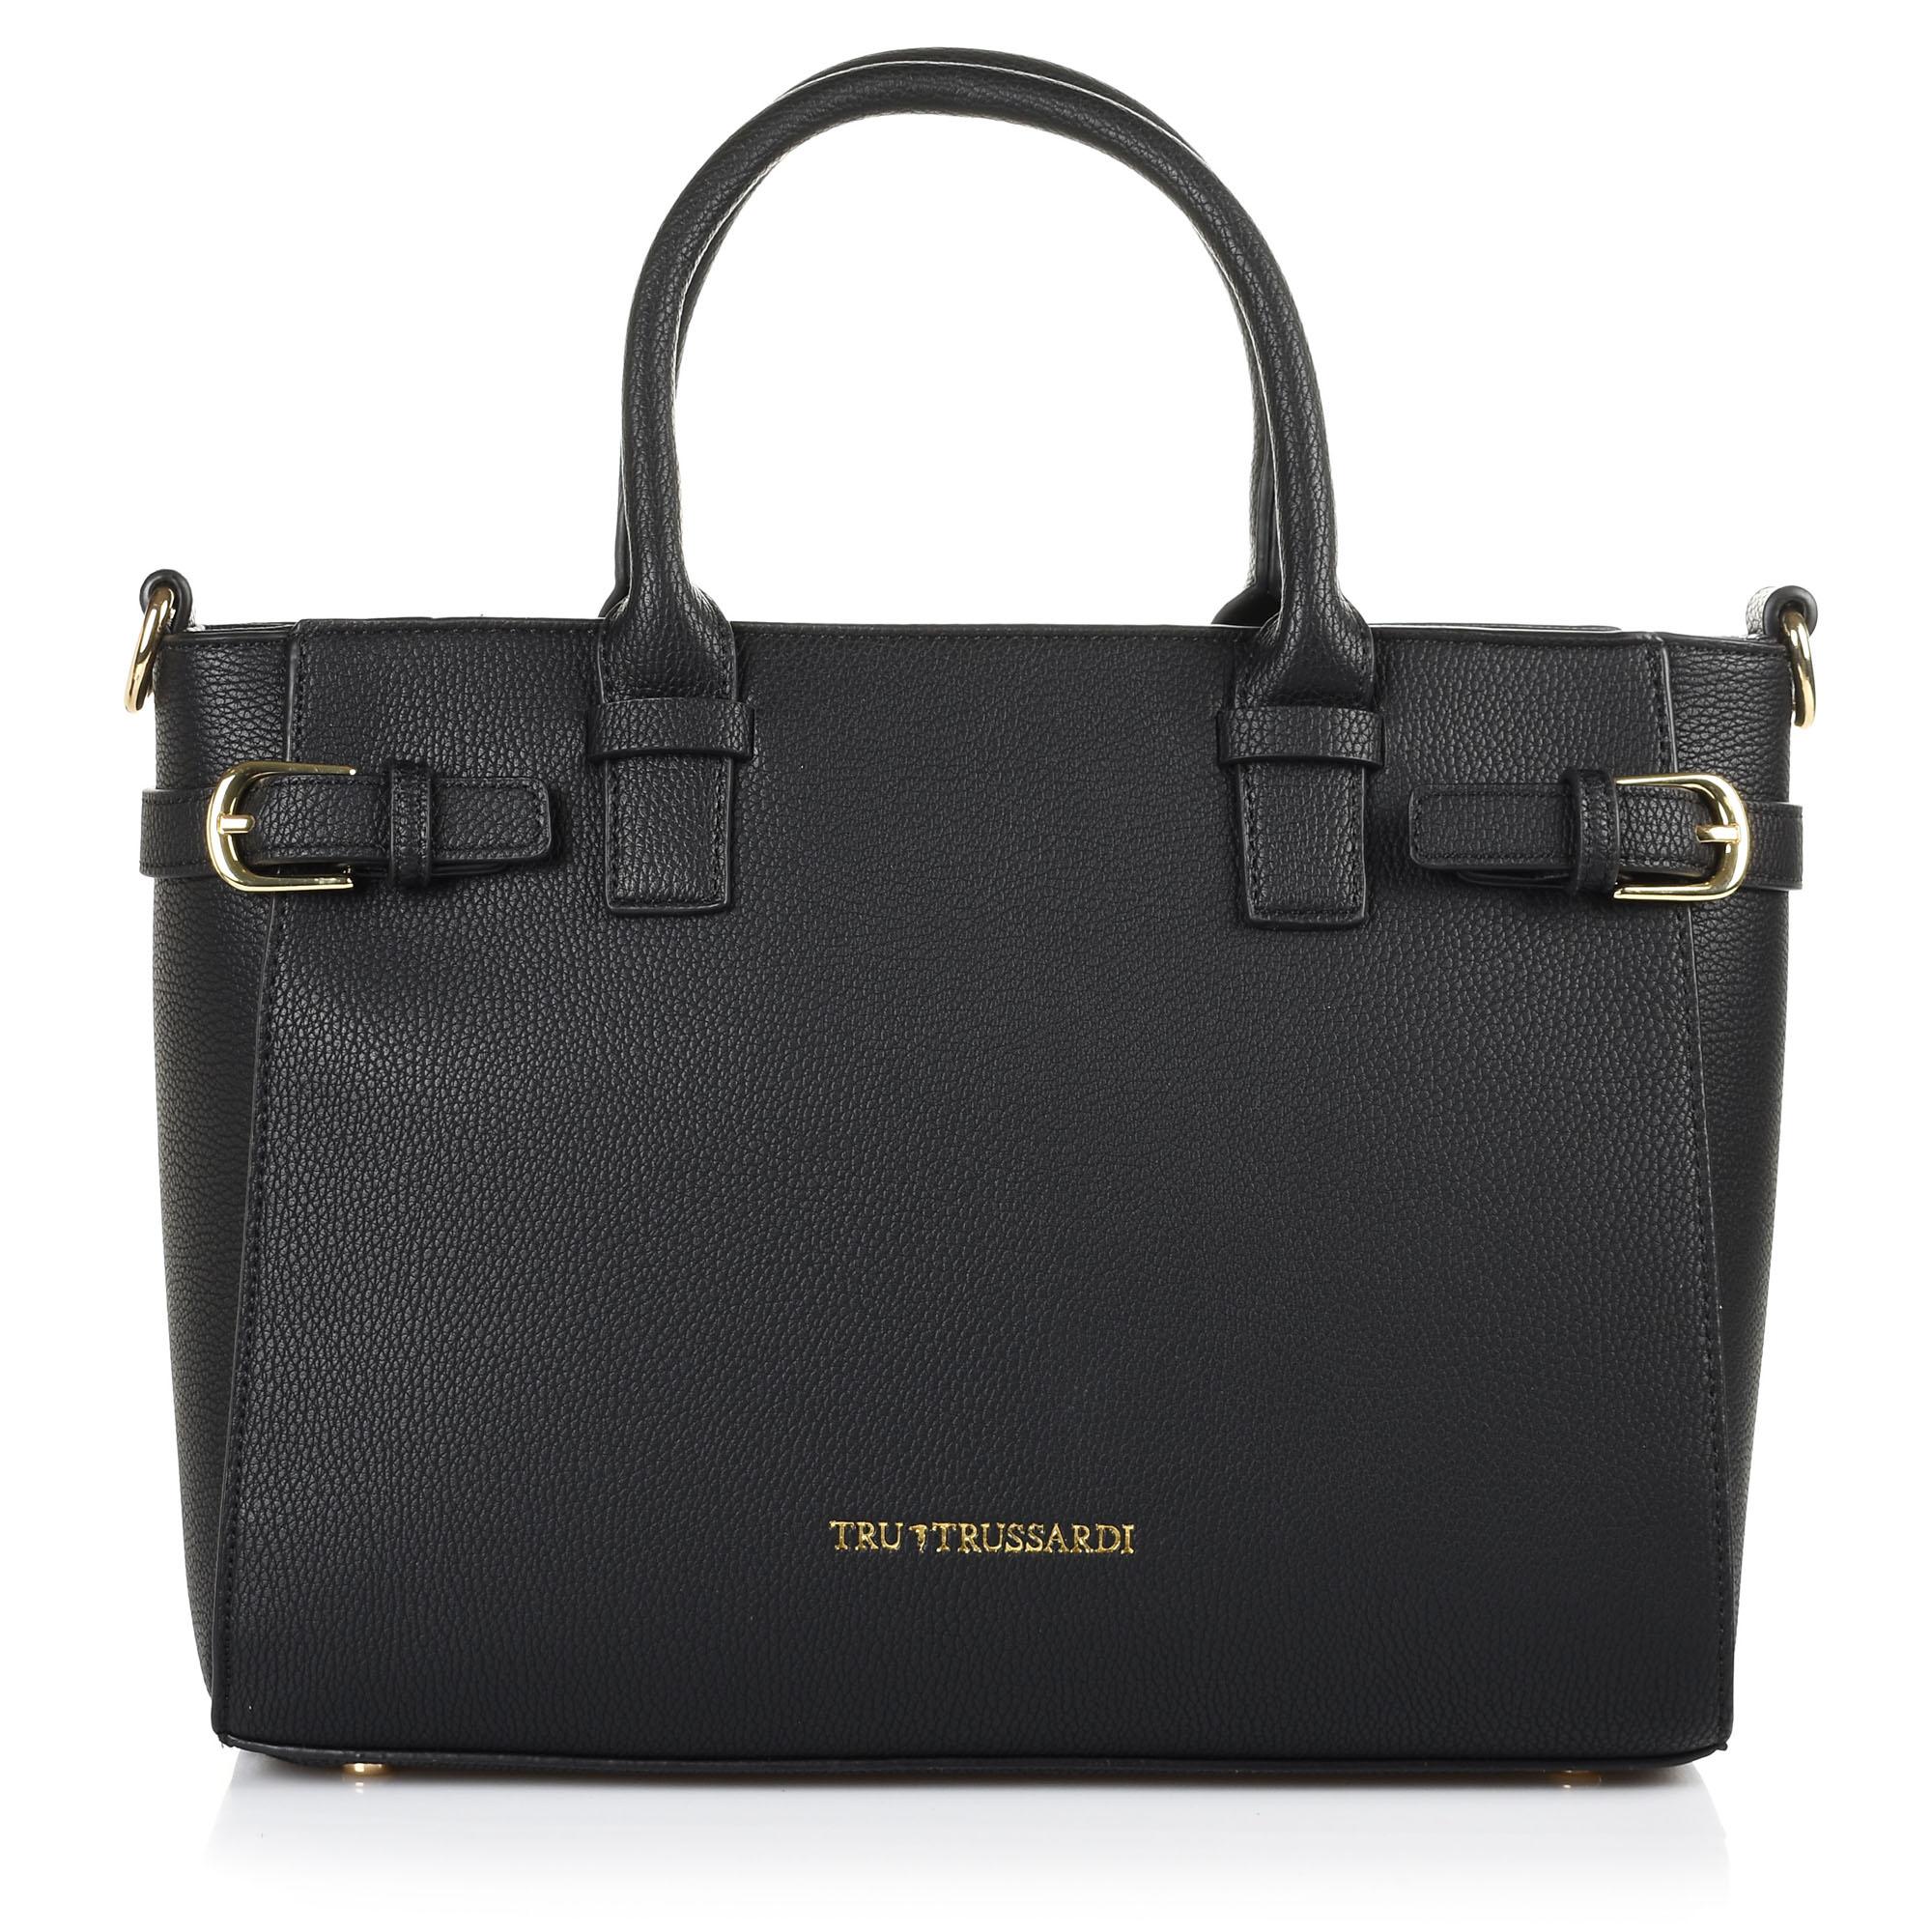 4c30036579 -20% Brand Bags Δερμάτινη Tote Τσάντα Tru Trussardi 76TB15